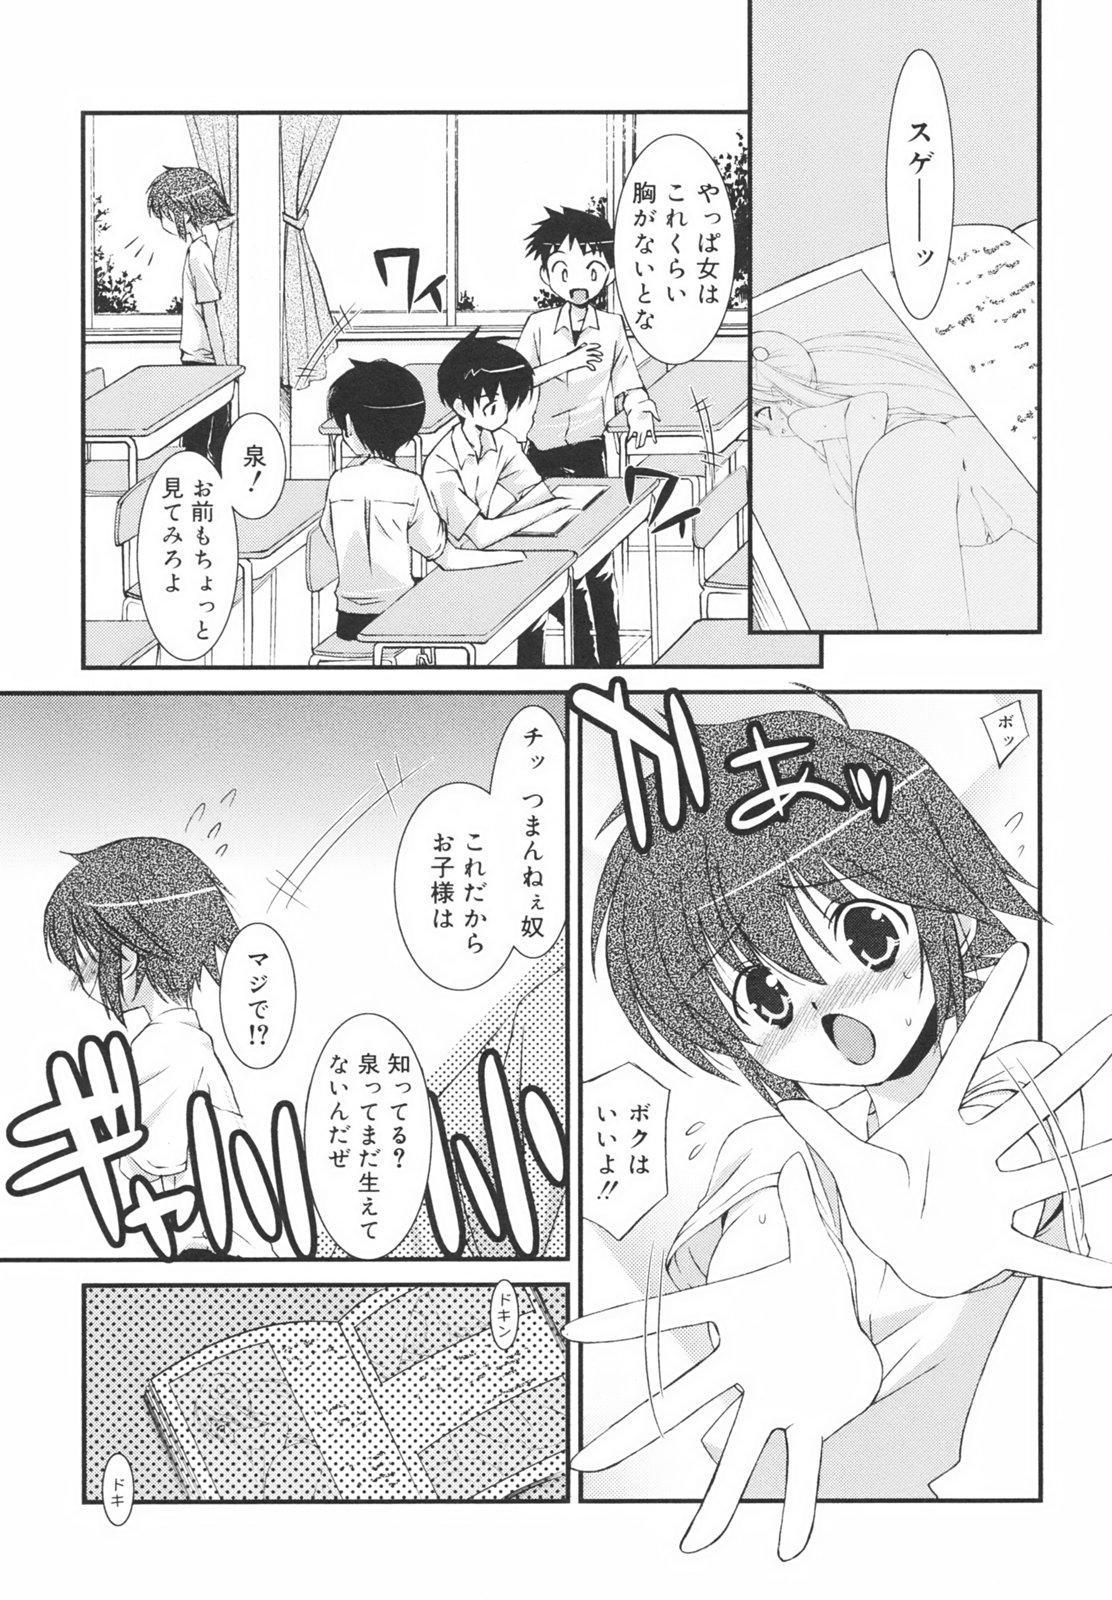 Gakkou No Nai Hi - A Day without School 68